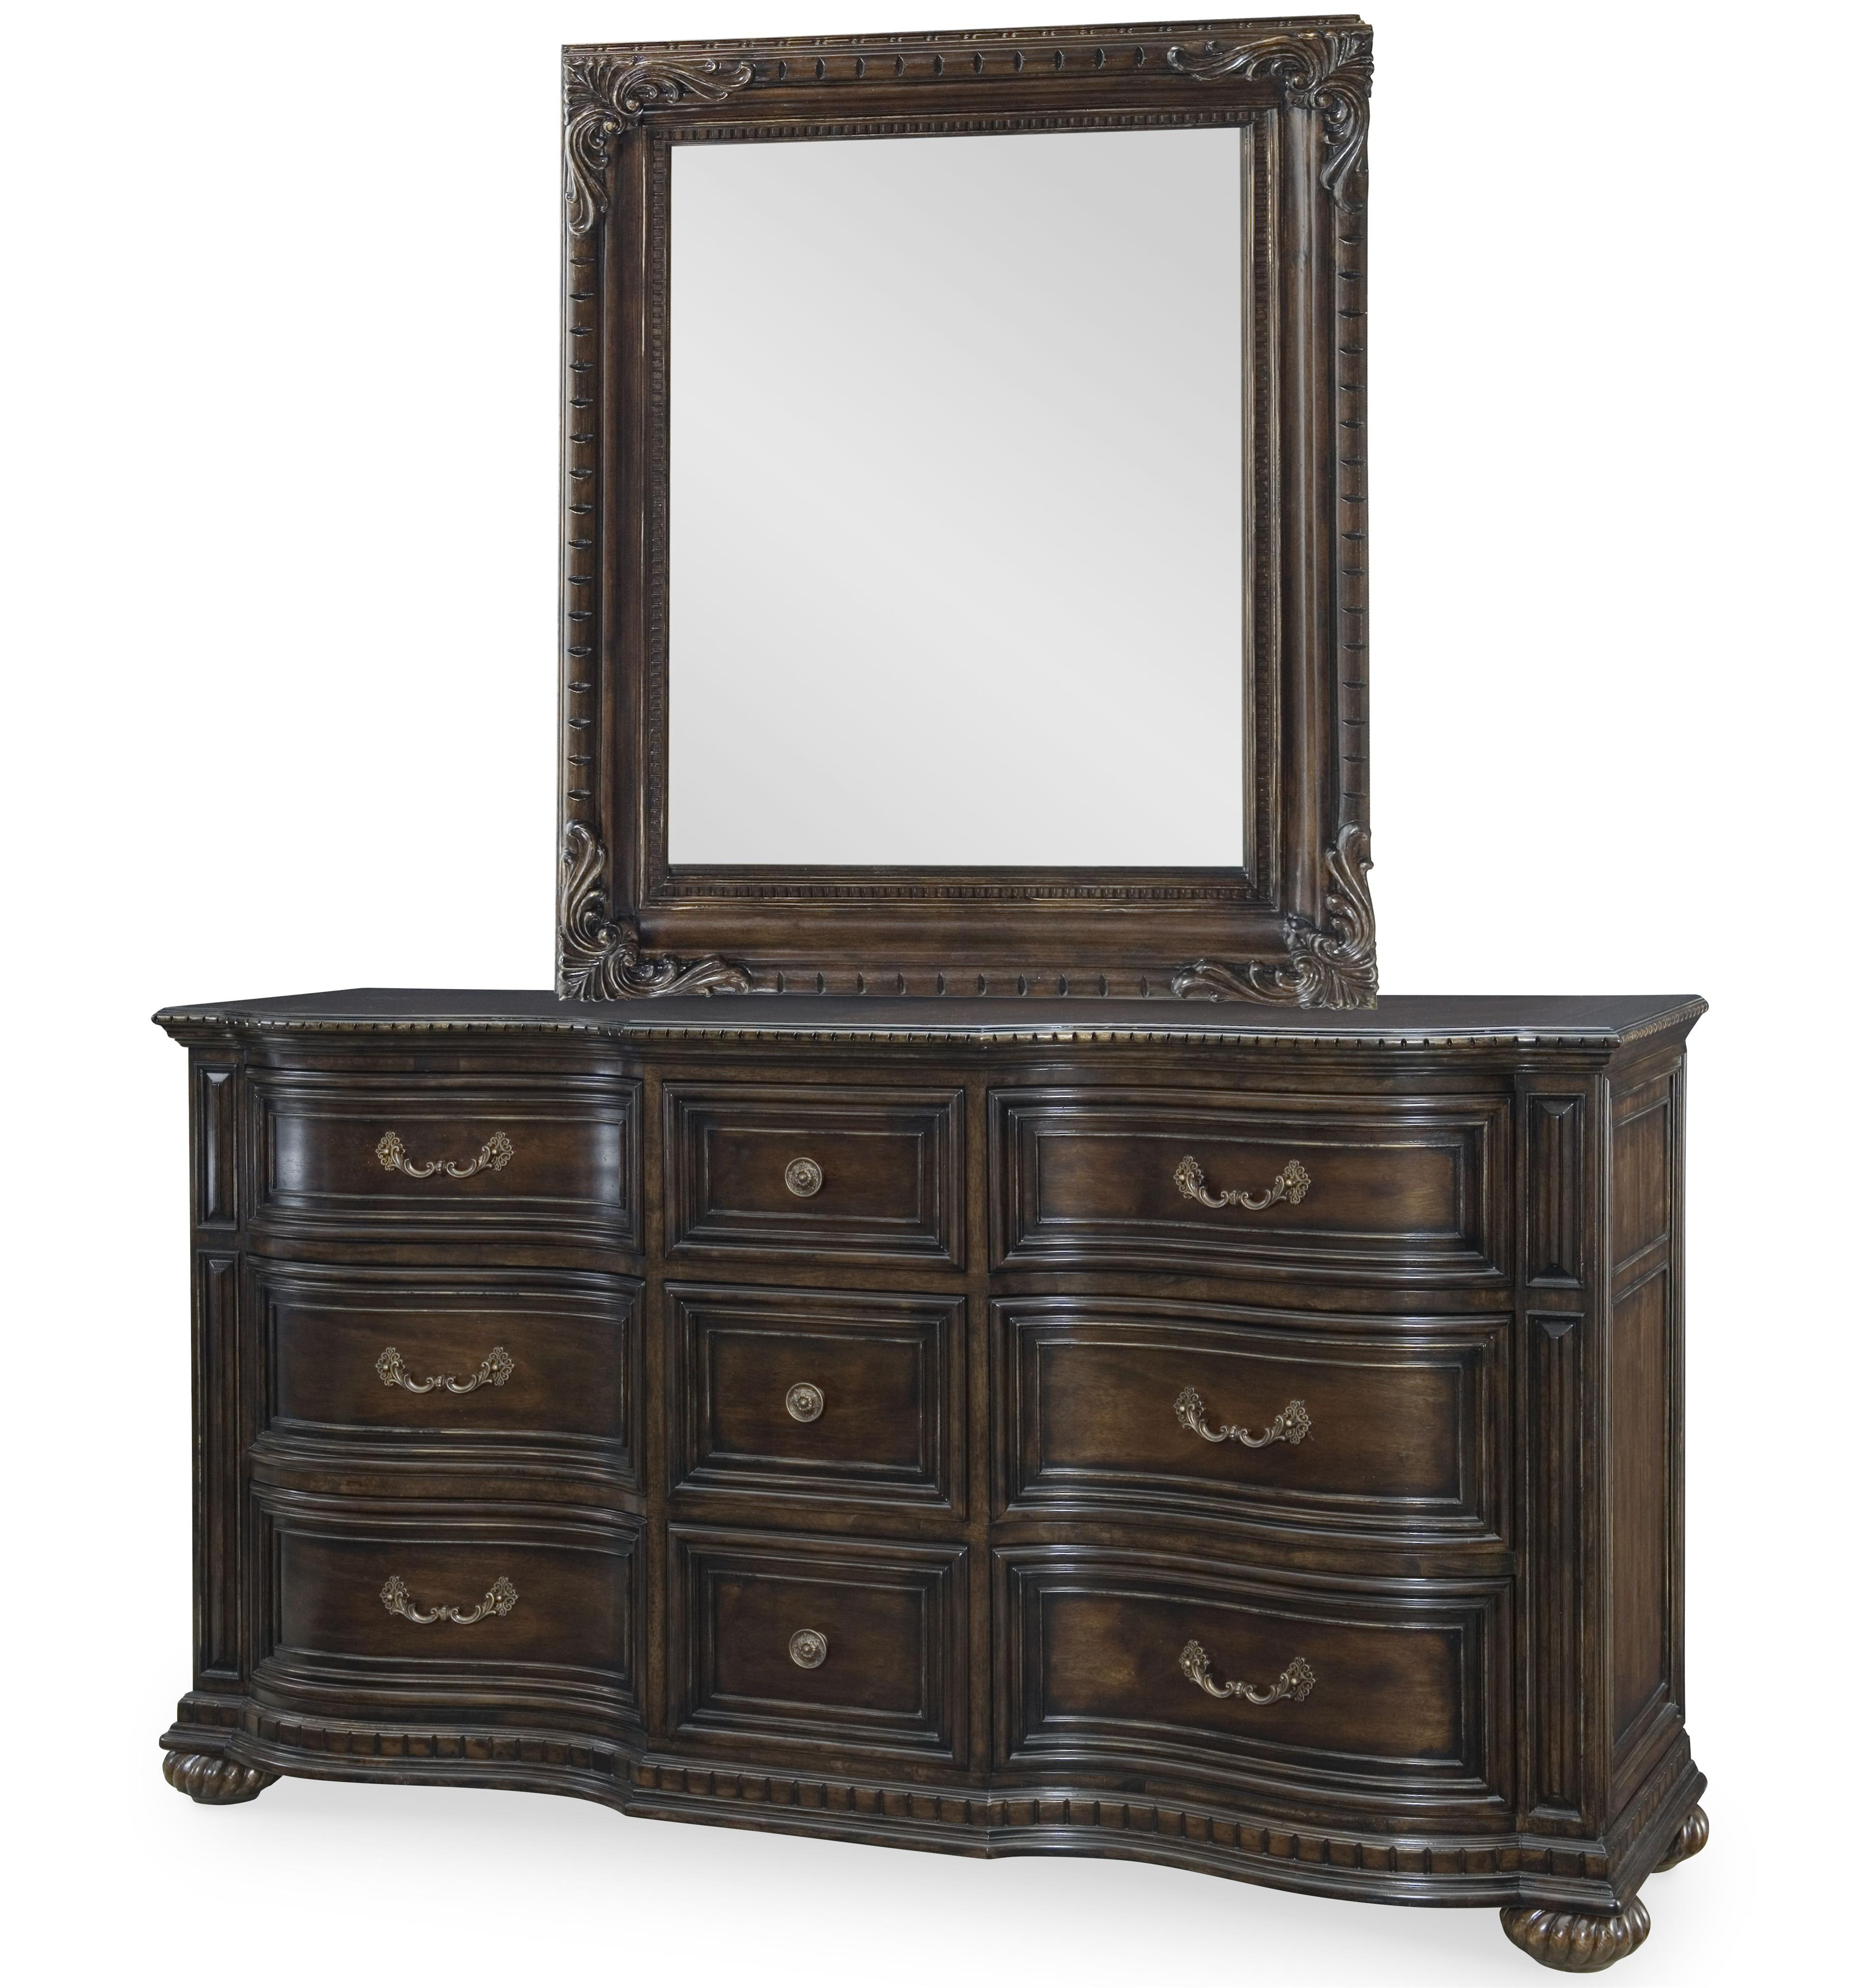 Legacy Classic La Bella Vita Dresser and Mirror Set - Item Number: 4200-1200+0100